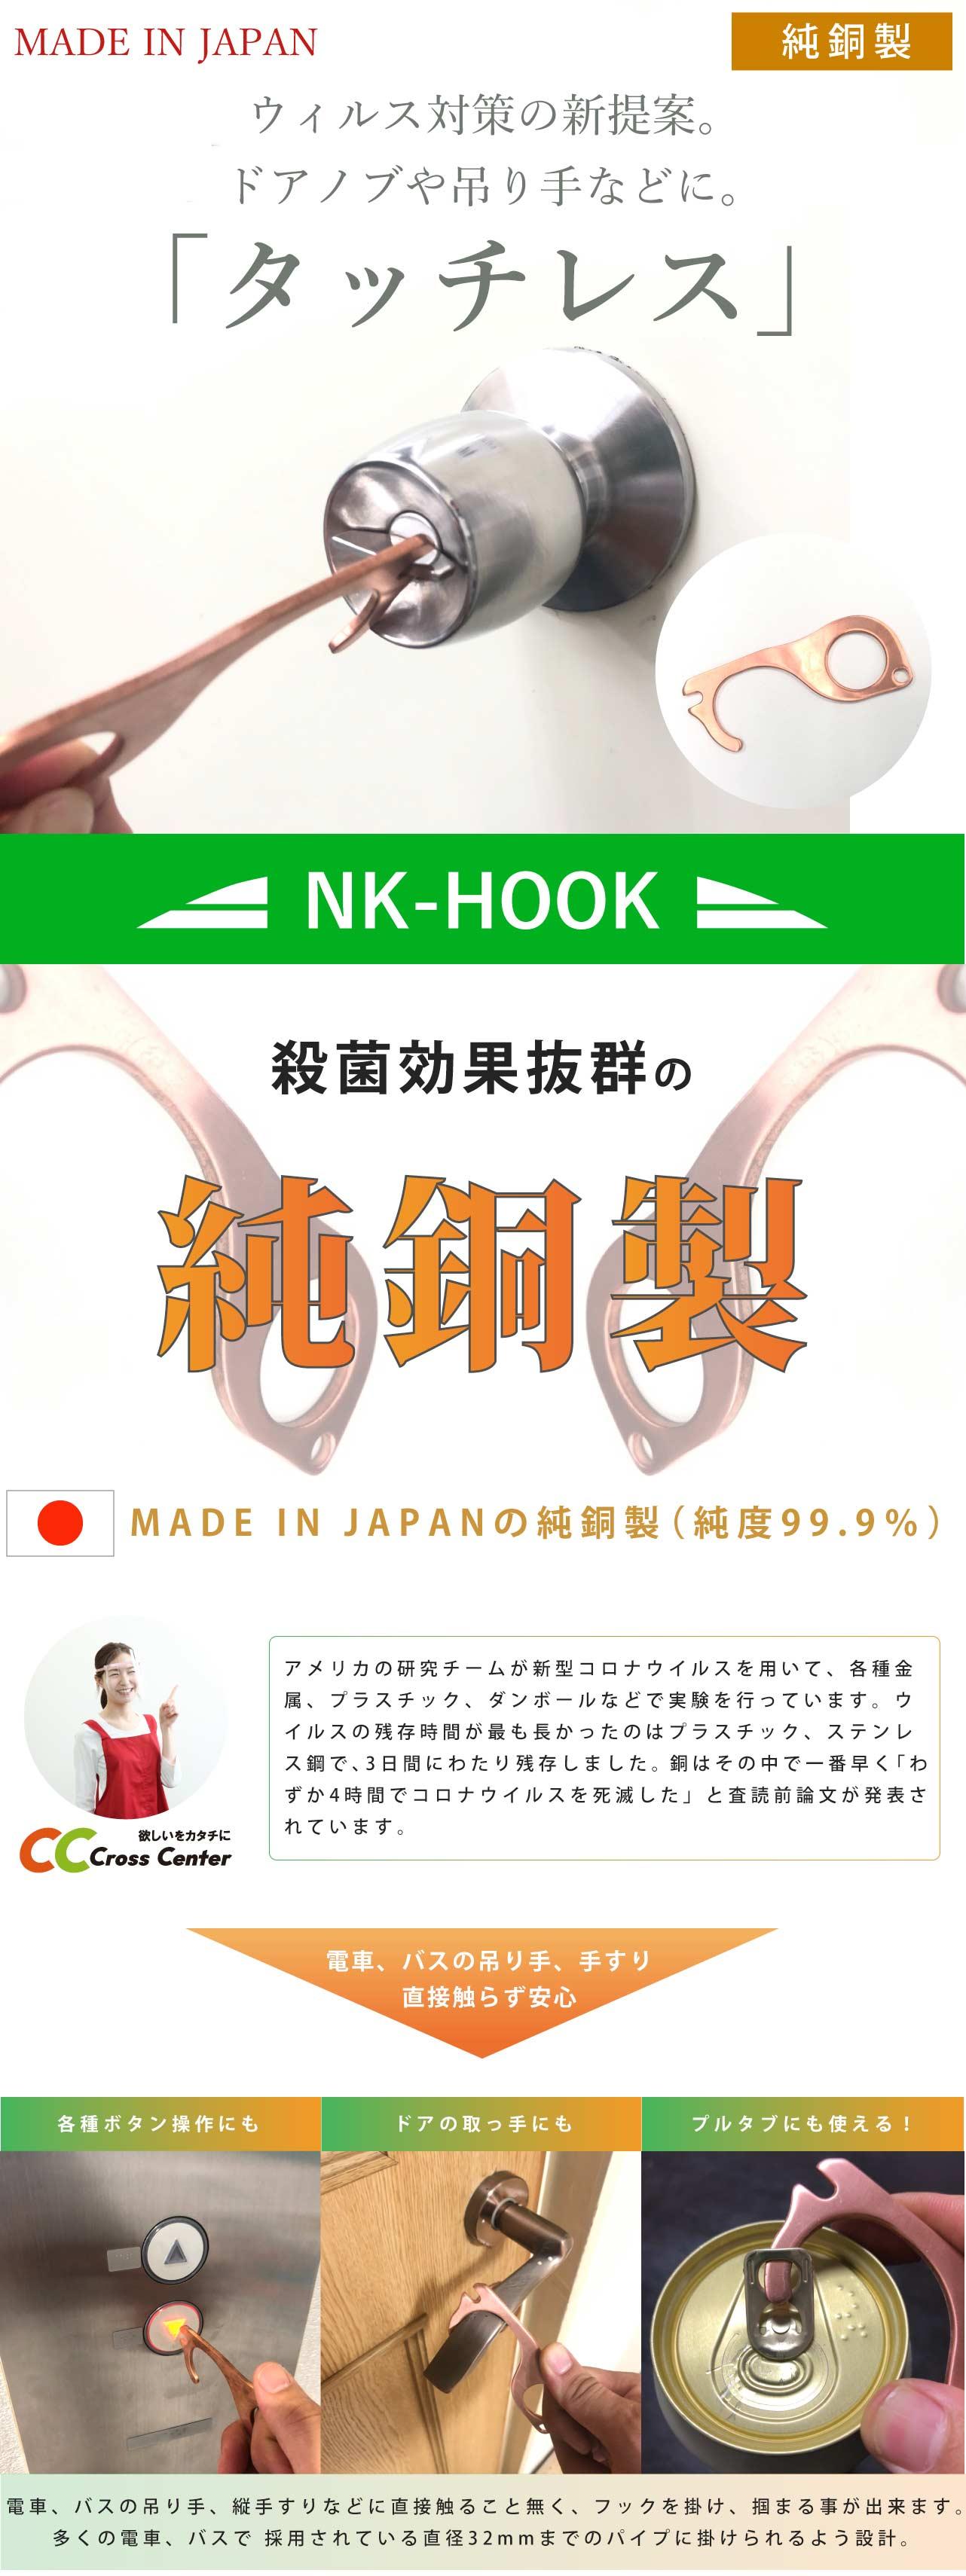 【NK-HOOK】タッチレスキーホルダー 純銅製